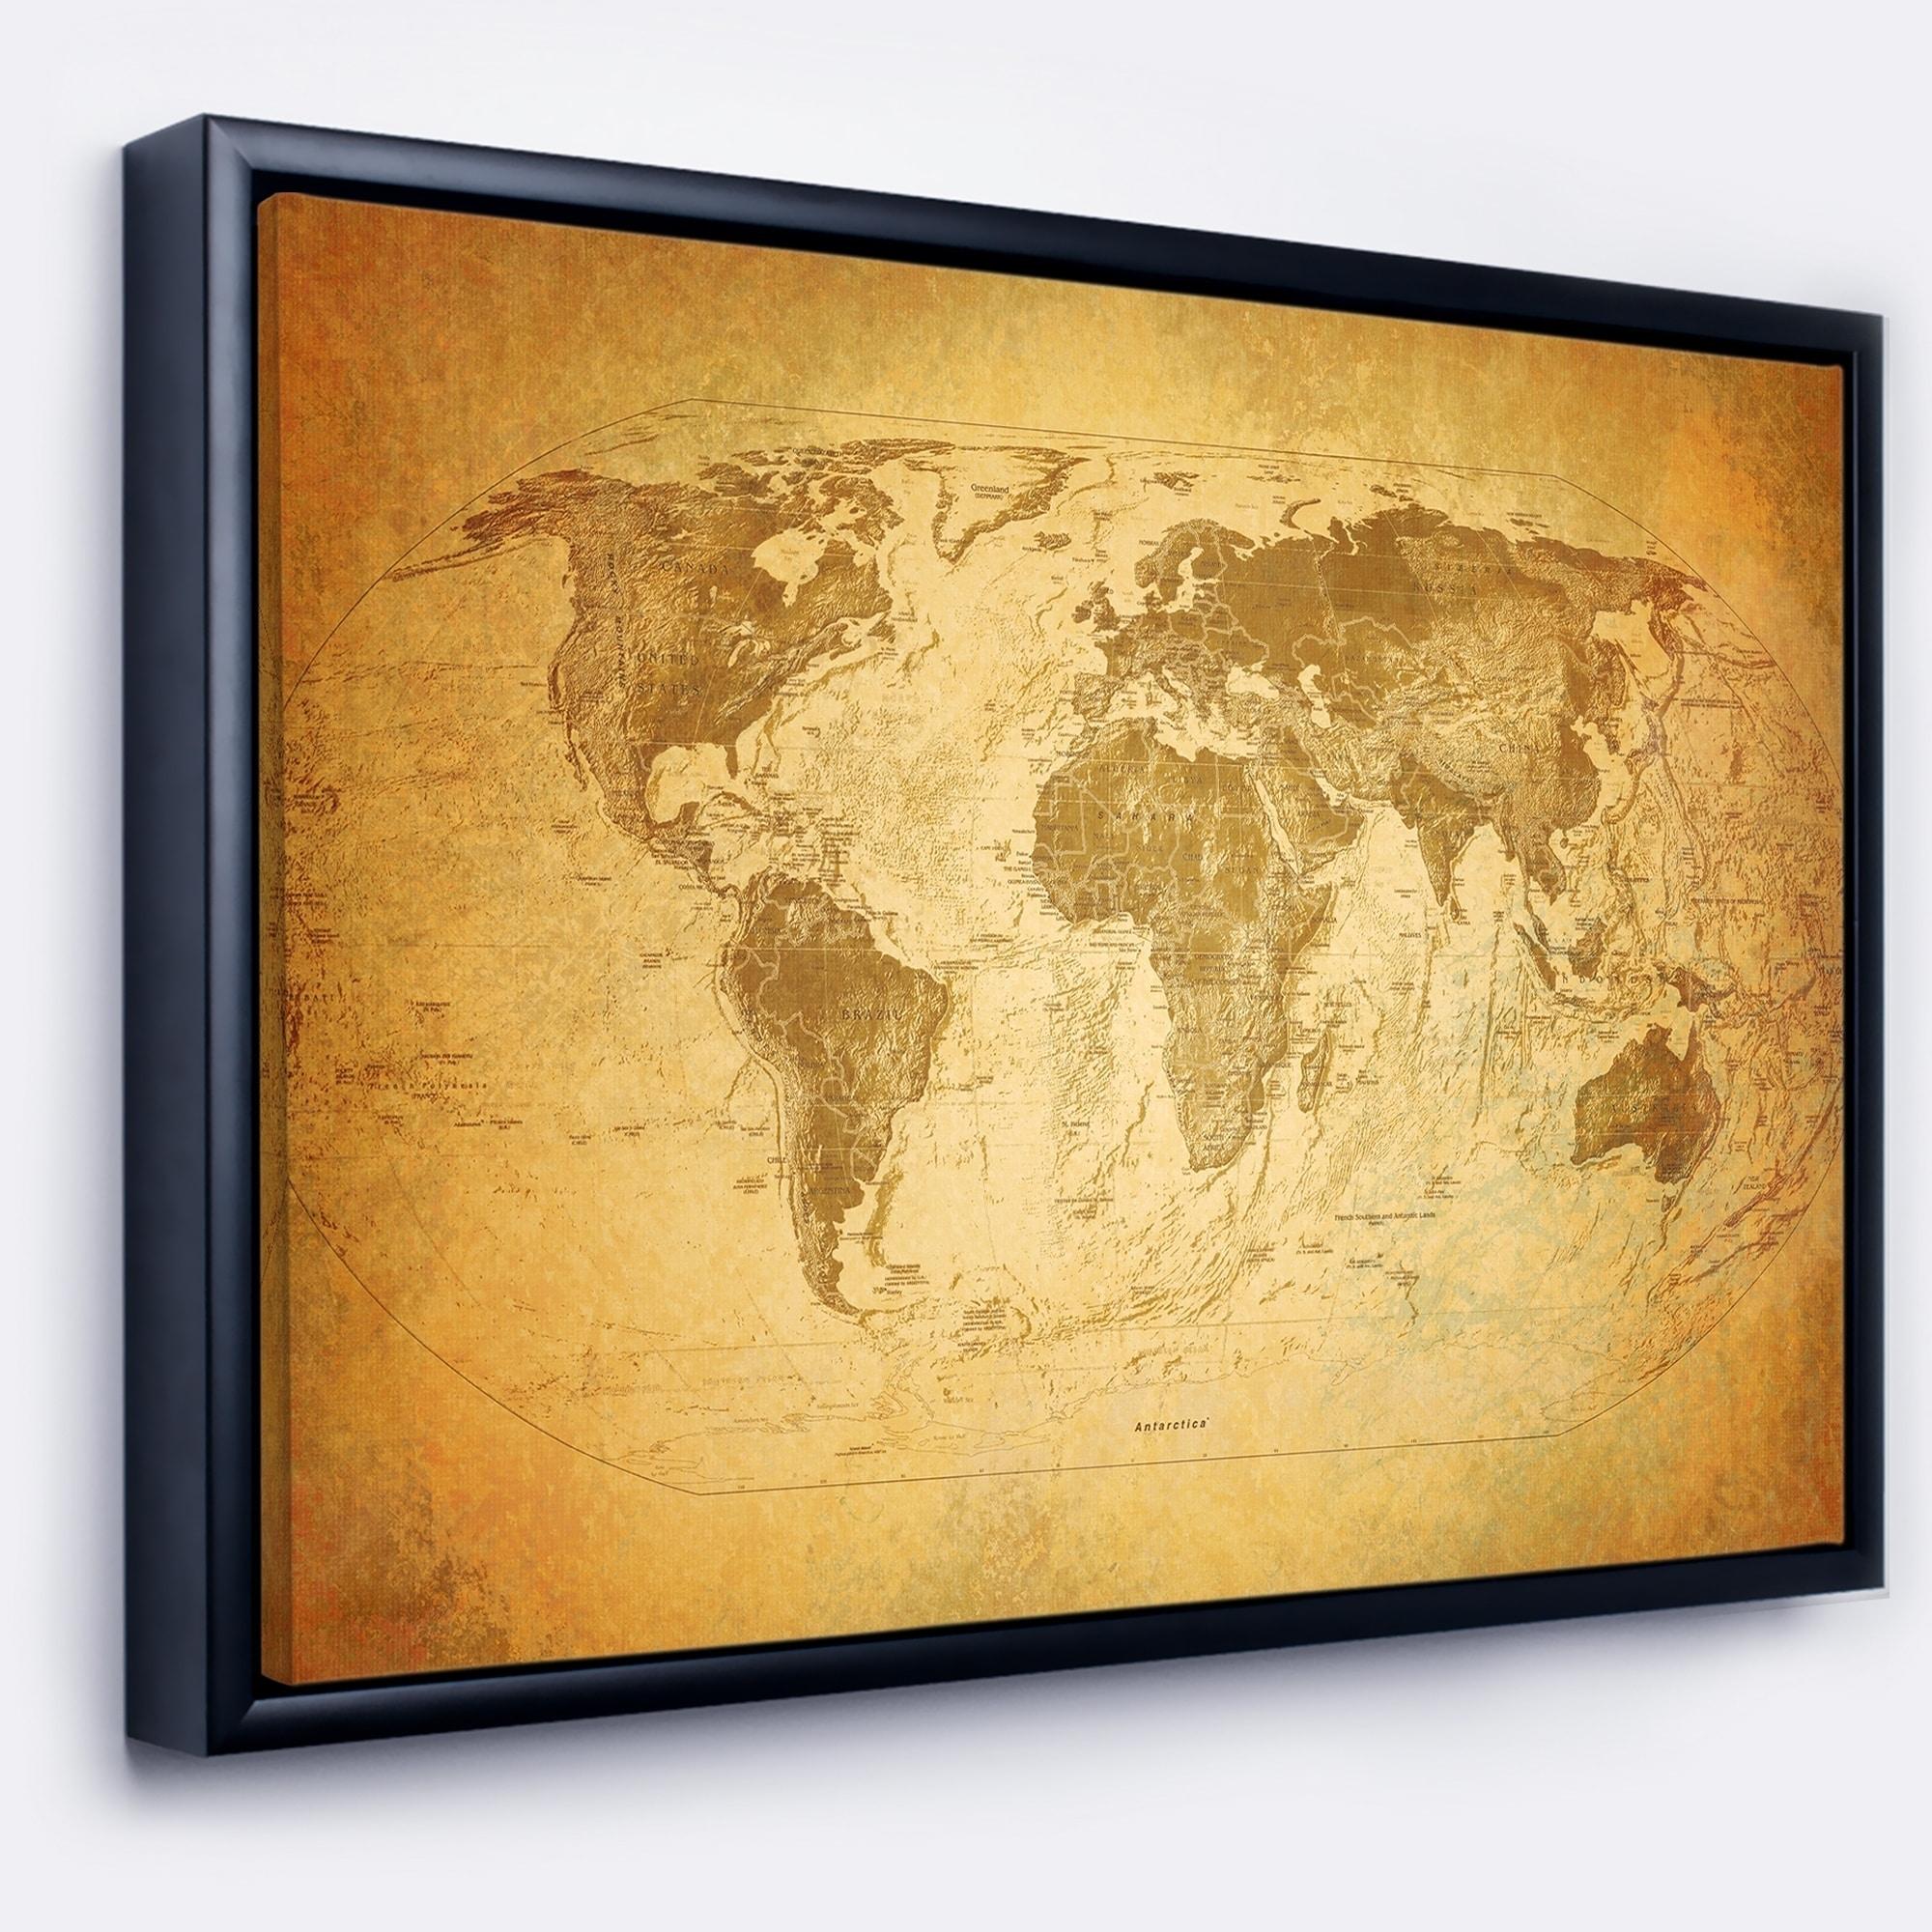 Shop Designart \'Vintage Classic Map\' Contemporary Framed Canvas Art ...